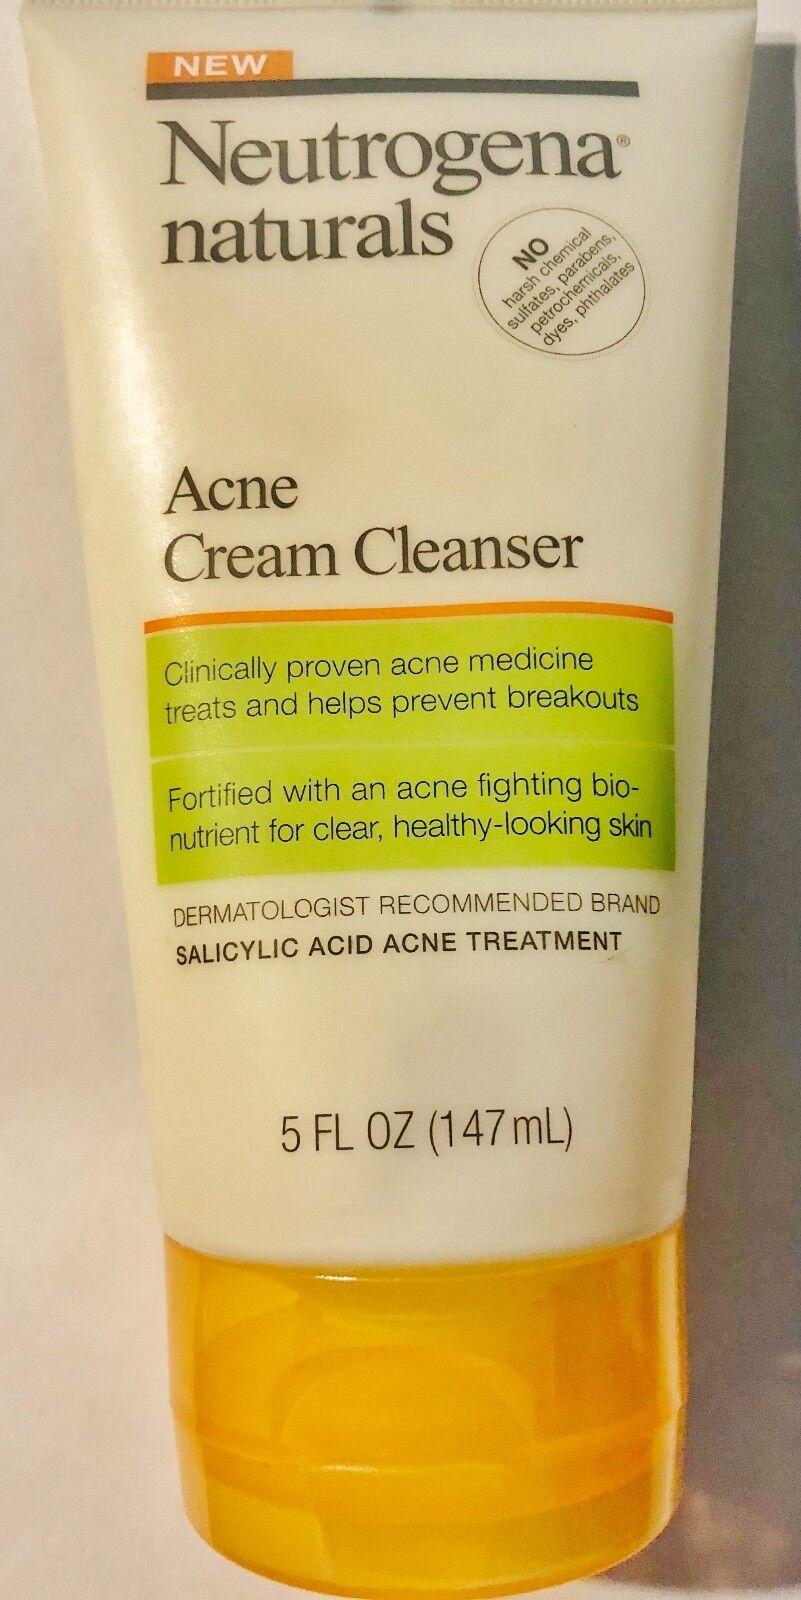 Neut Nat Acne Cream Clean Size 5z Neutrogena Naturals Acne C